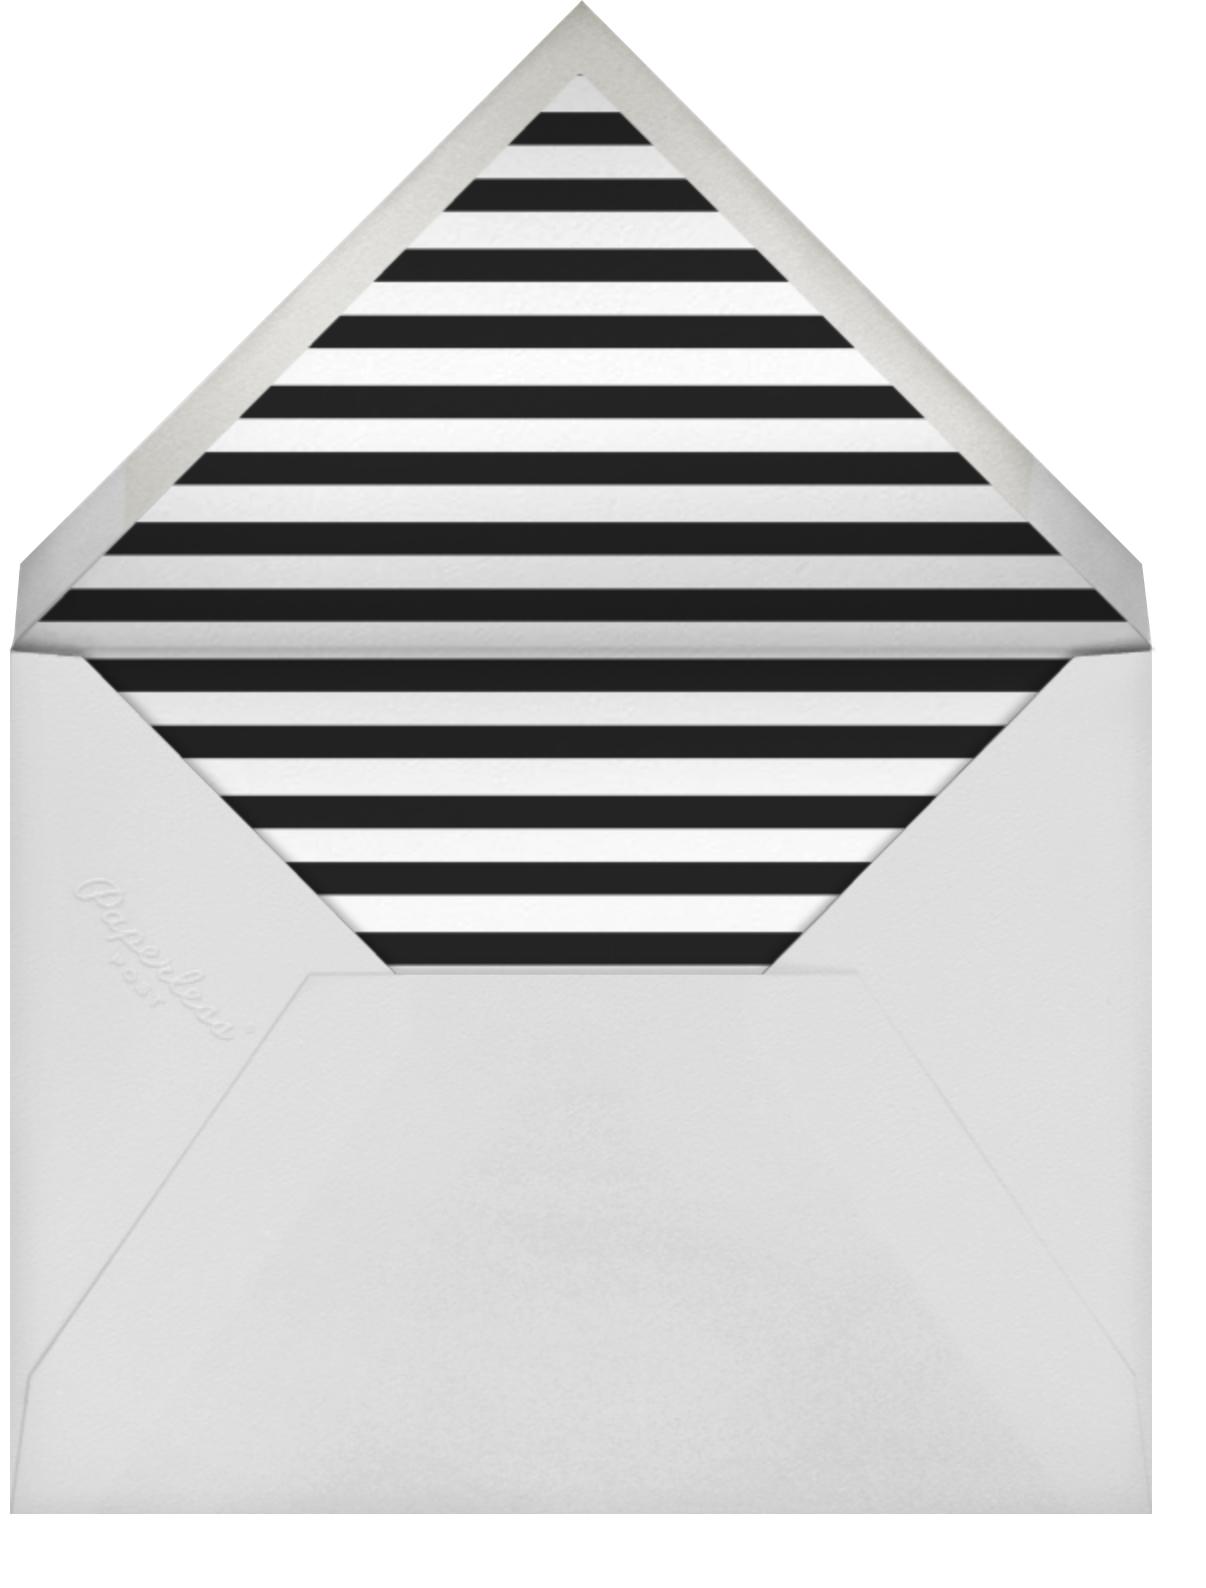 Three Photo Strips - Paperless Post - Envelope